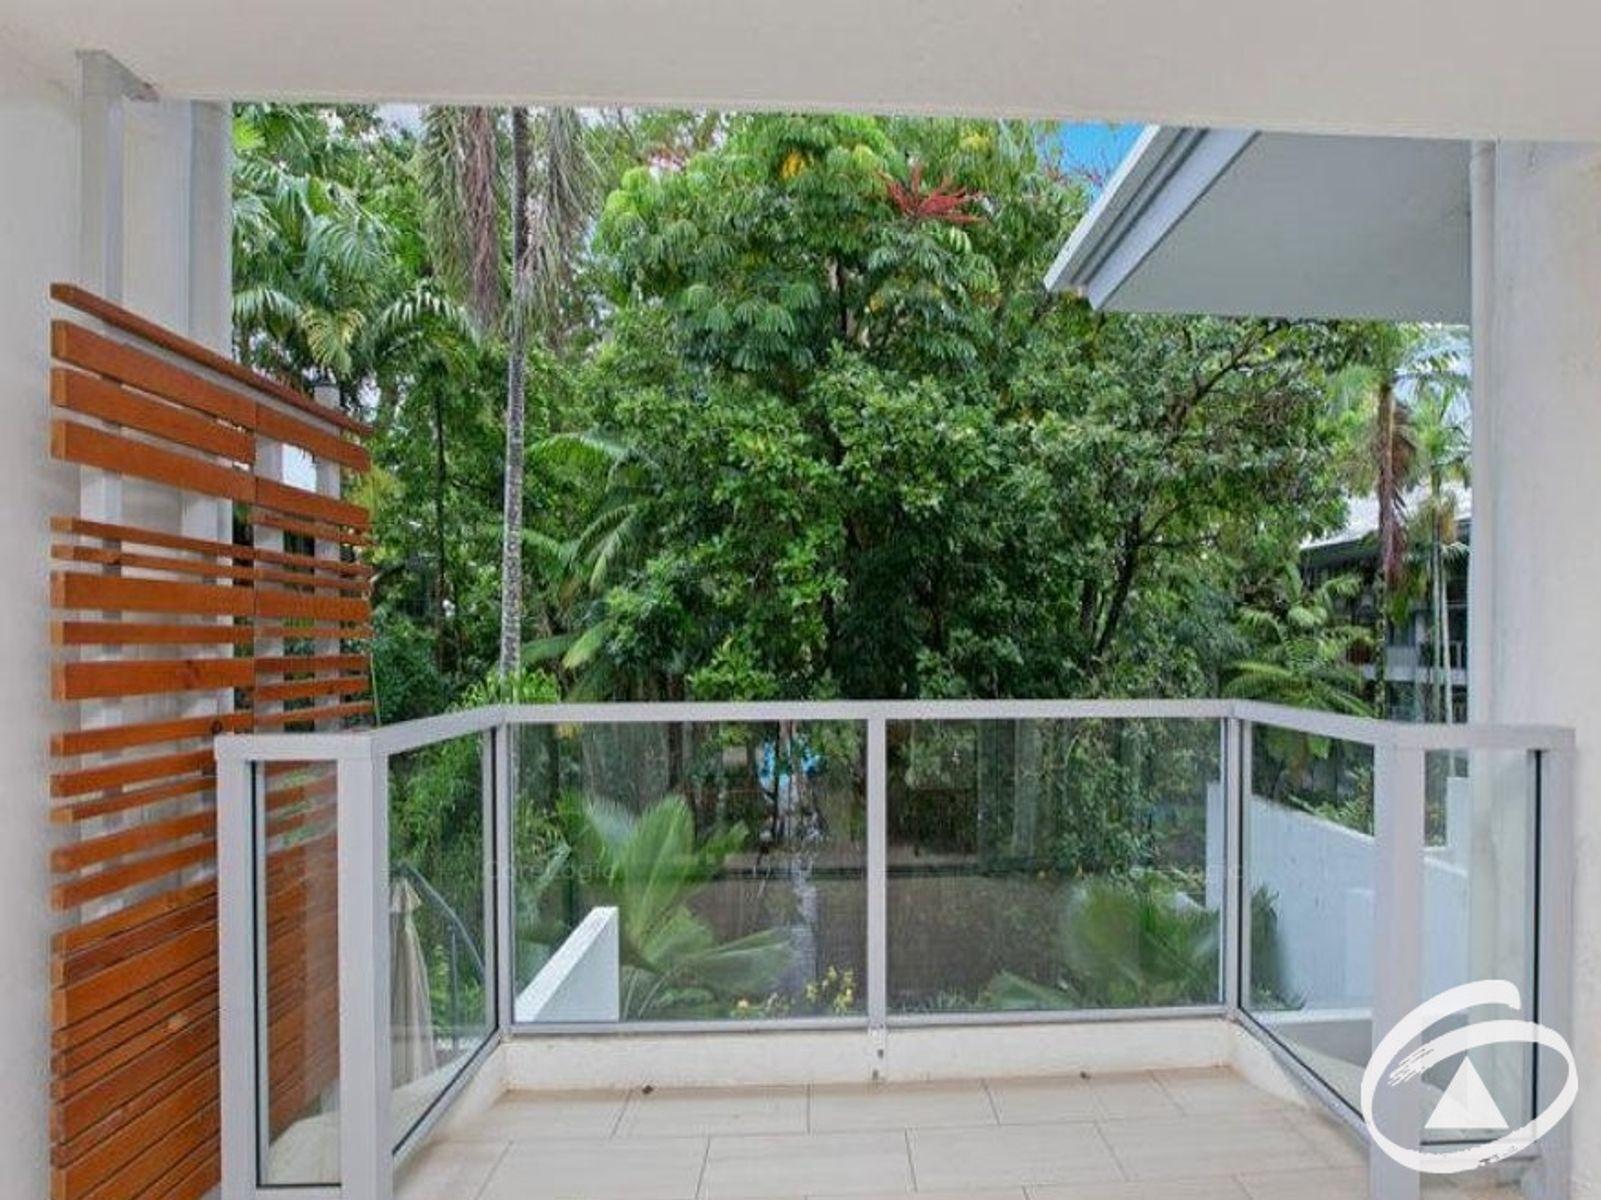 3301/41 williams esplanade, Palm Cove, QLD 4879